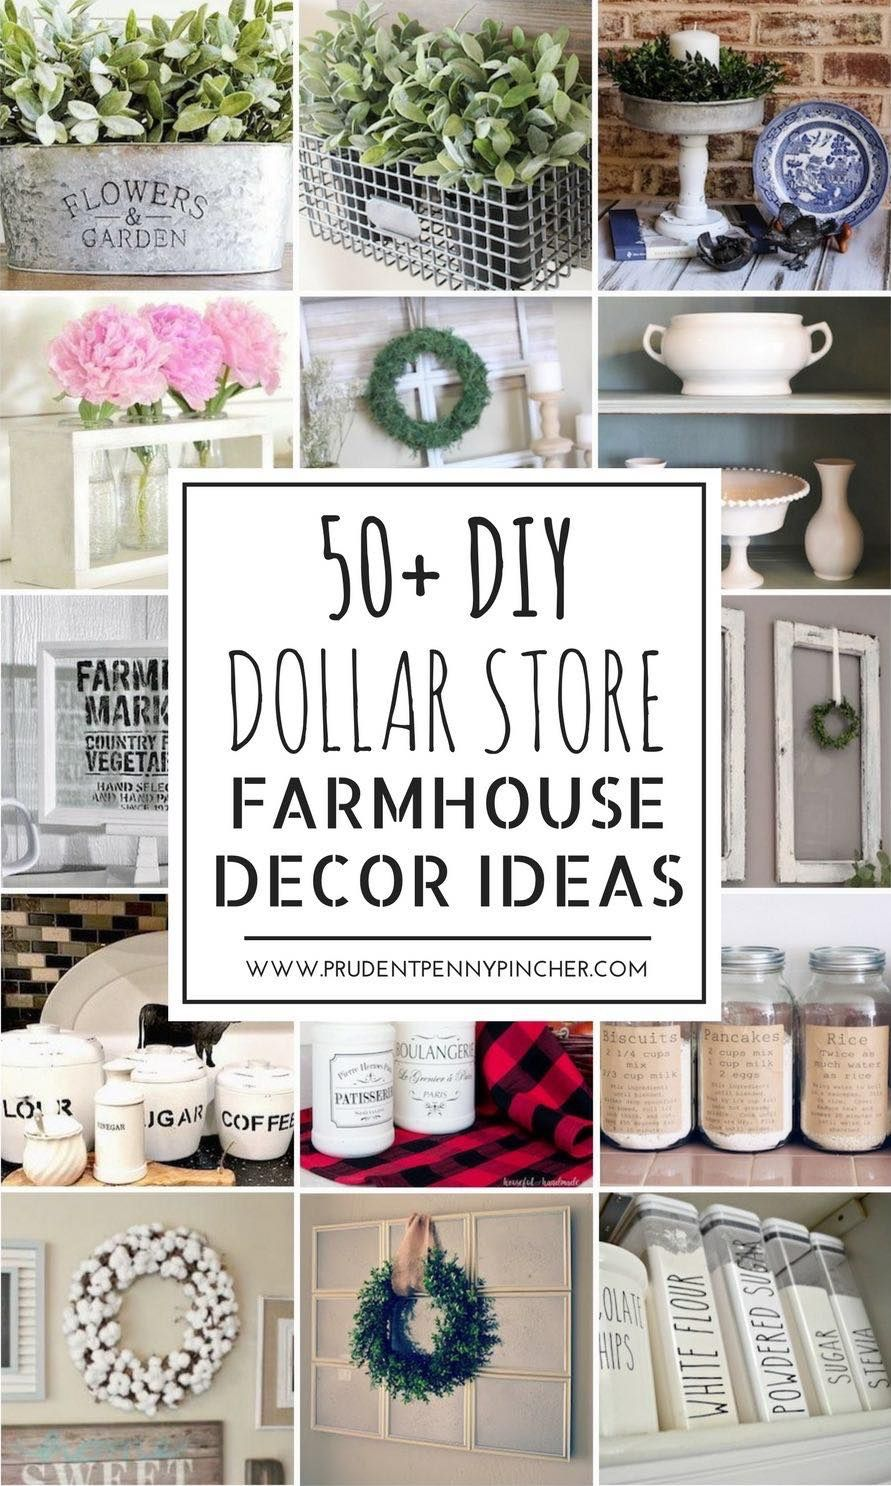 50 Dollar Store Diy Farmhouse Decor Ideas Dollar Store Decor Easy Home Decor Dollar Store Diy